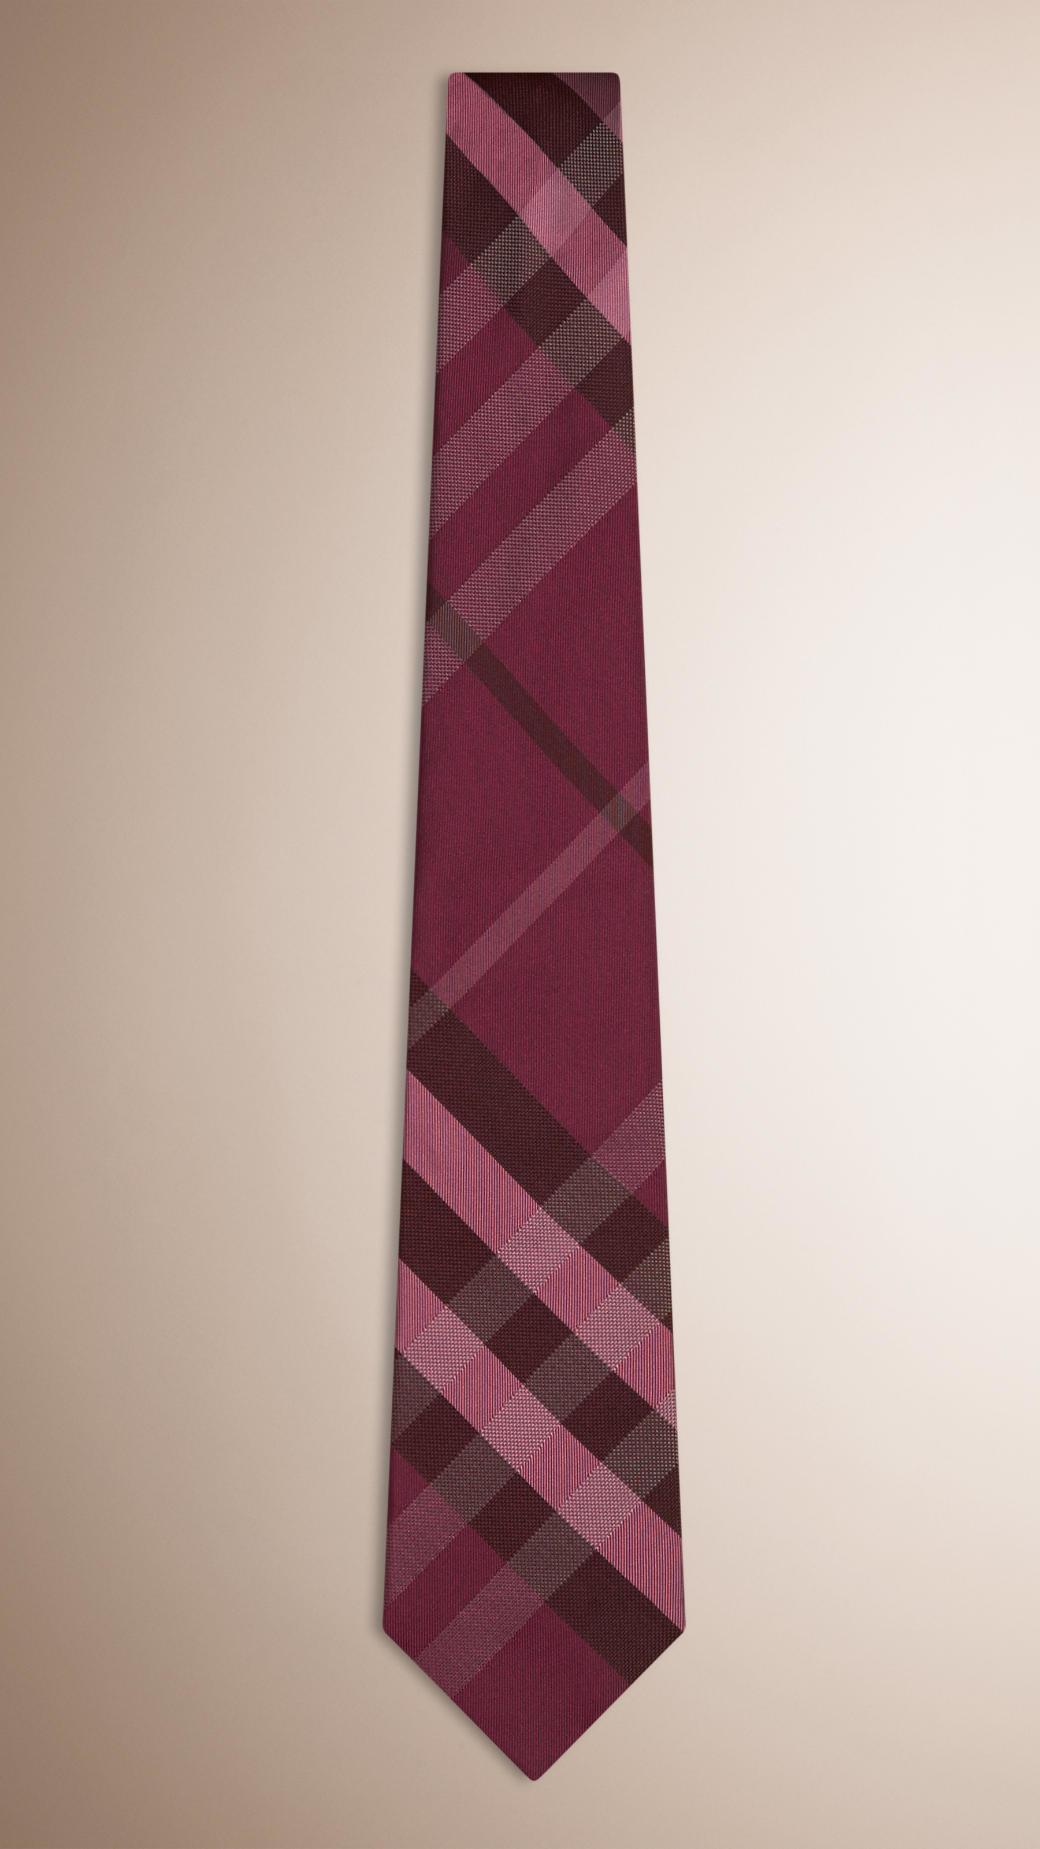 Slim Cut Daisy Silk Jacquard Tie - Pink & Purple Burberry Cheap Manchester t9LODT